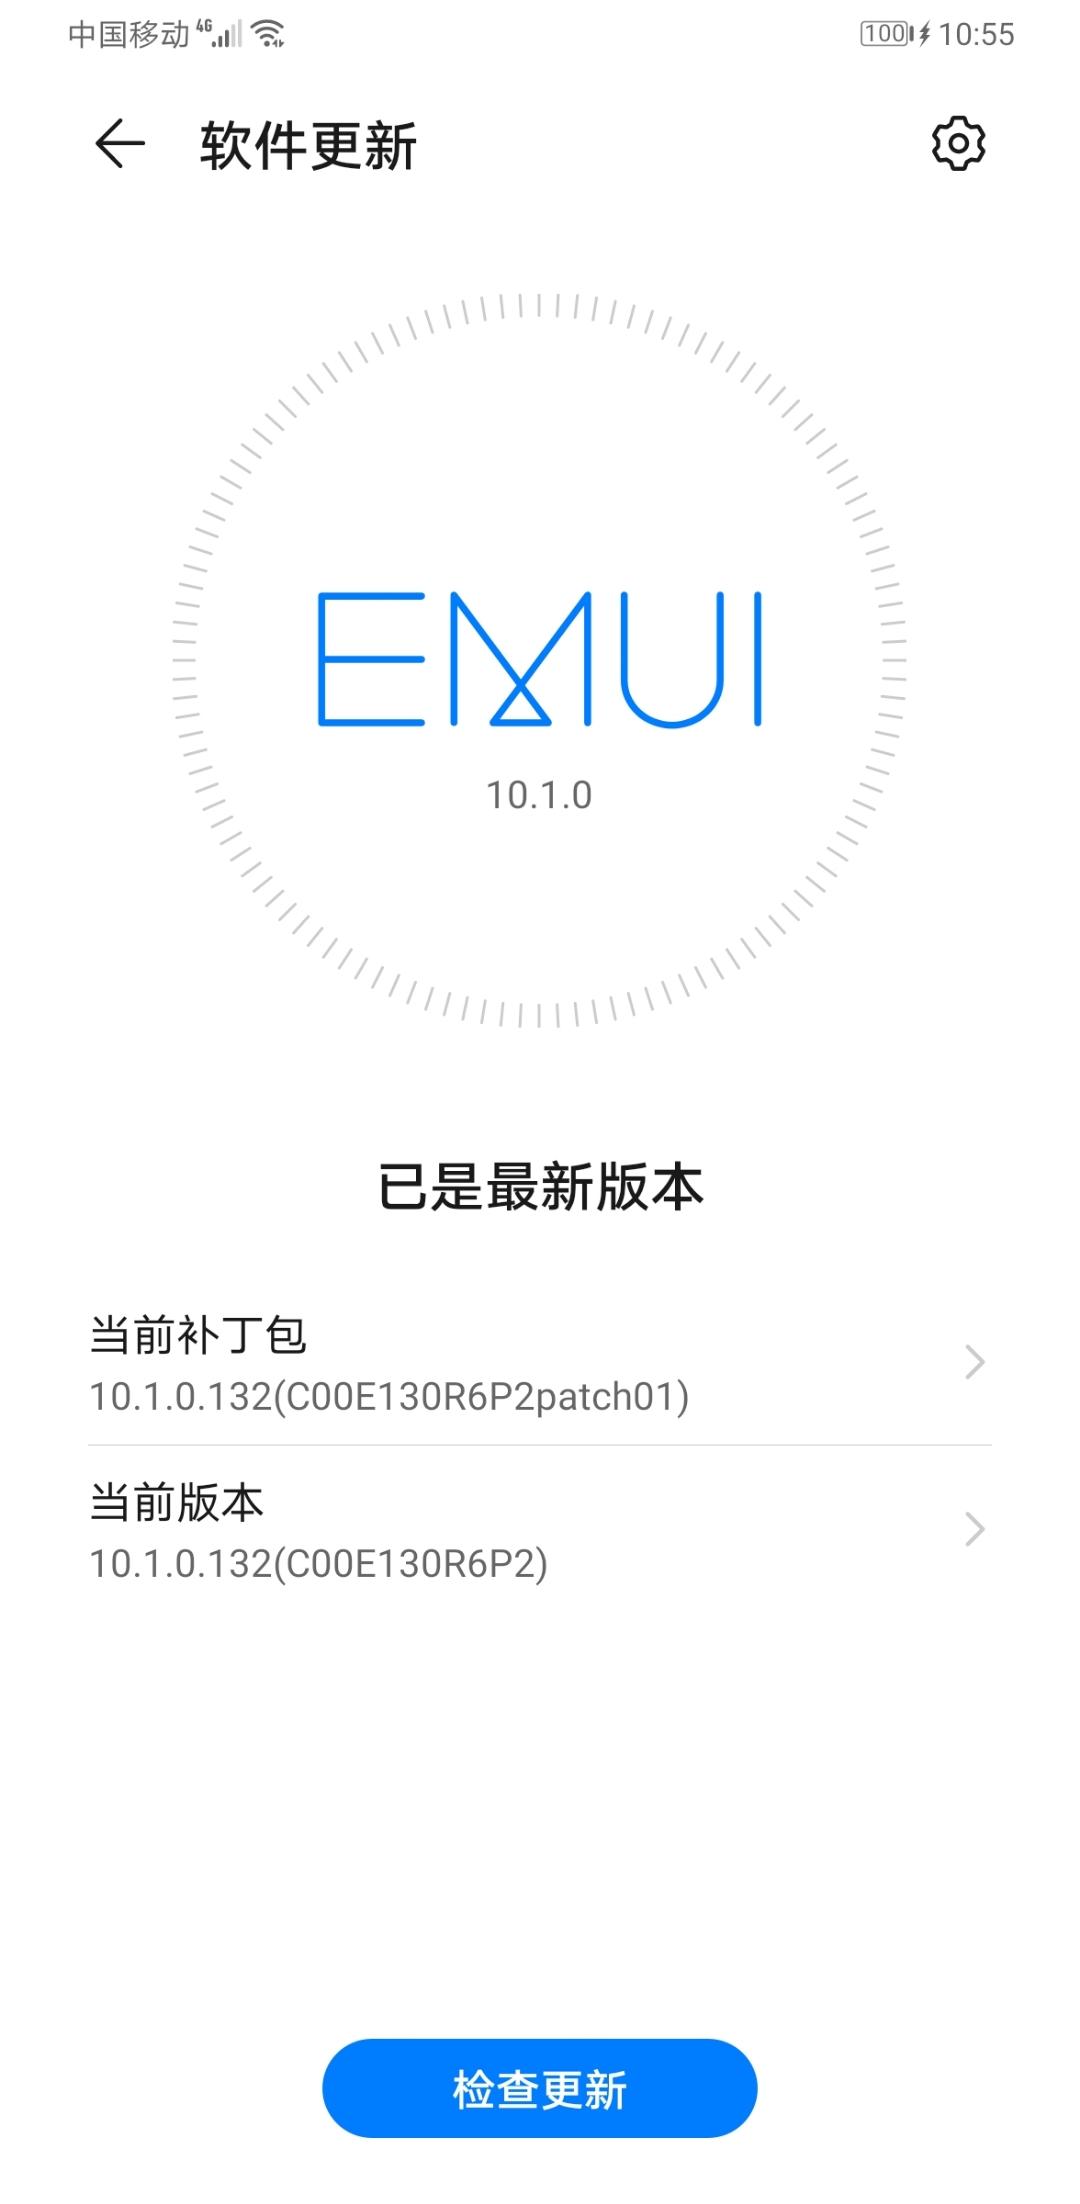 Screenshot_20200516_105552_com.huawei.android.hwouc.jpg